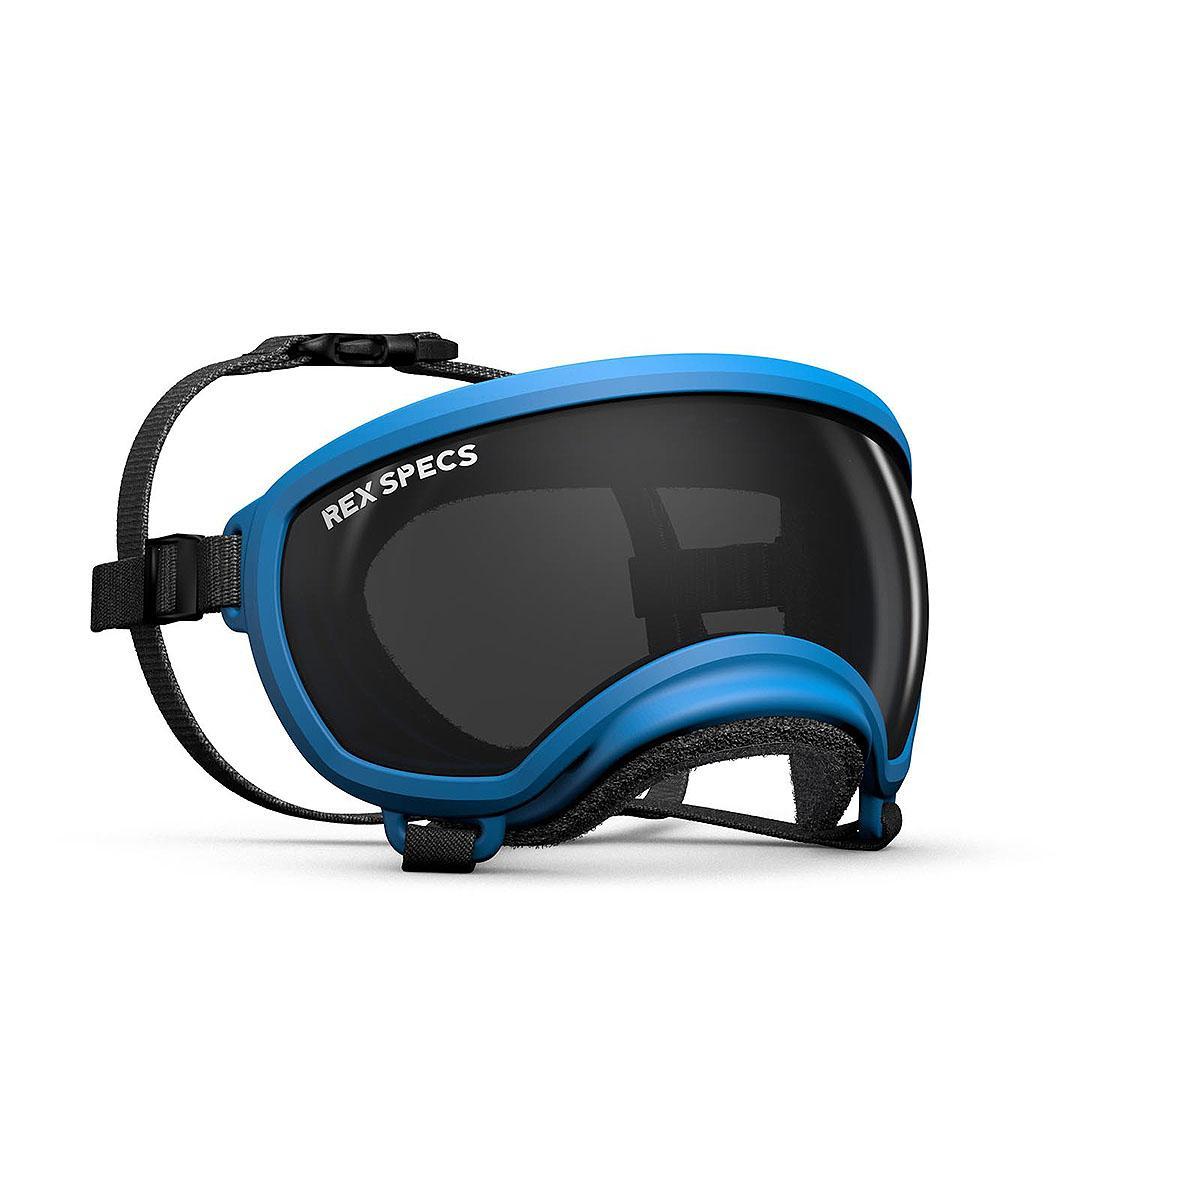 Rex Specs Dog Goggles - Apollo Blue